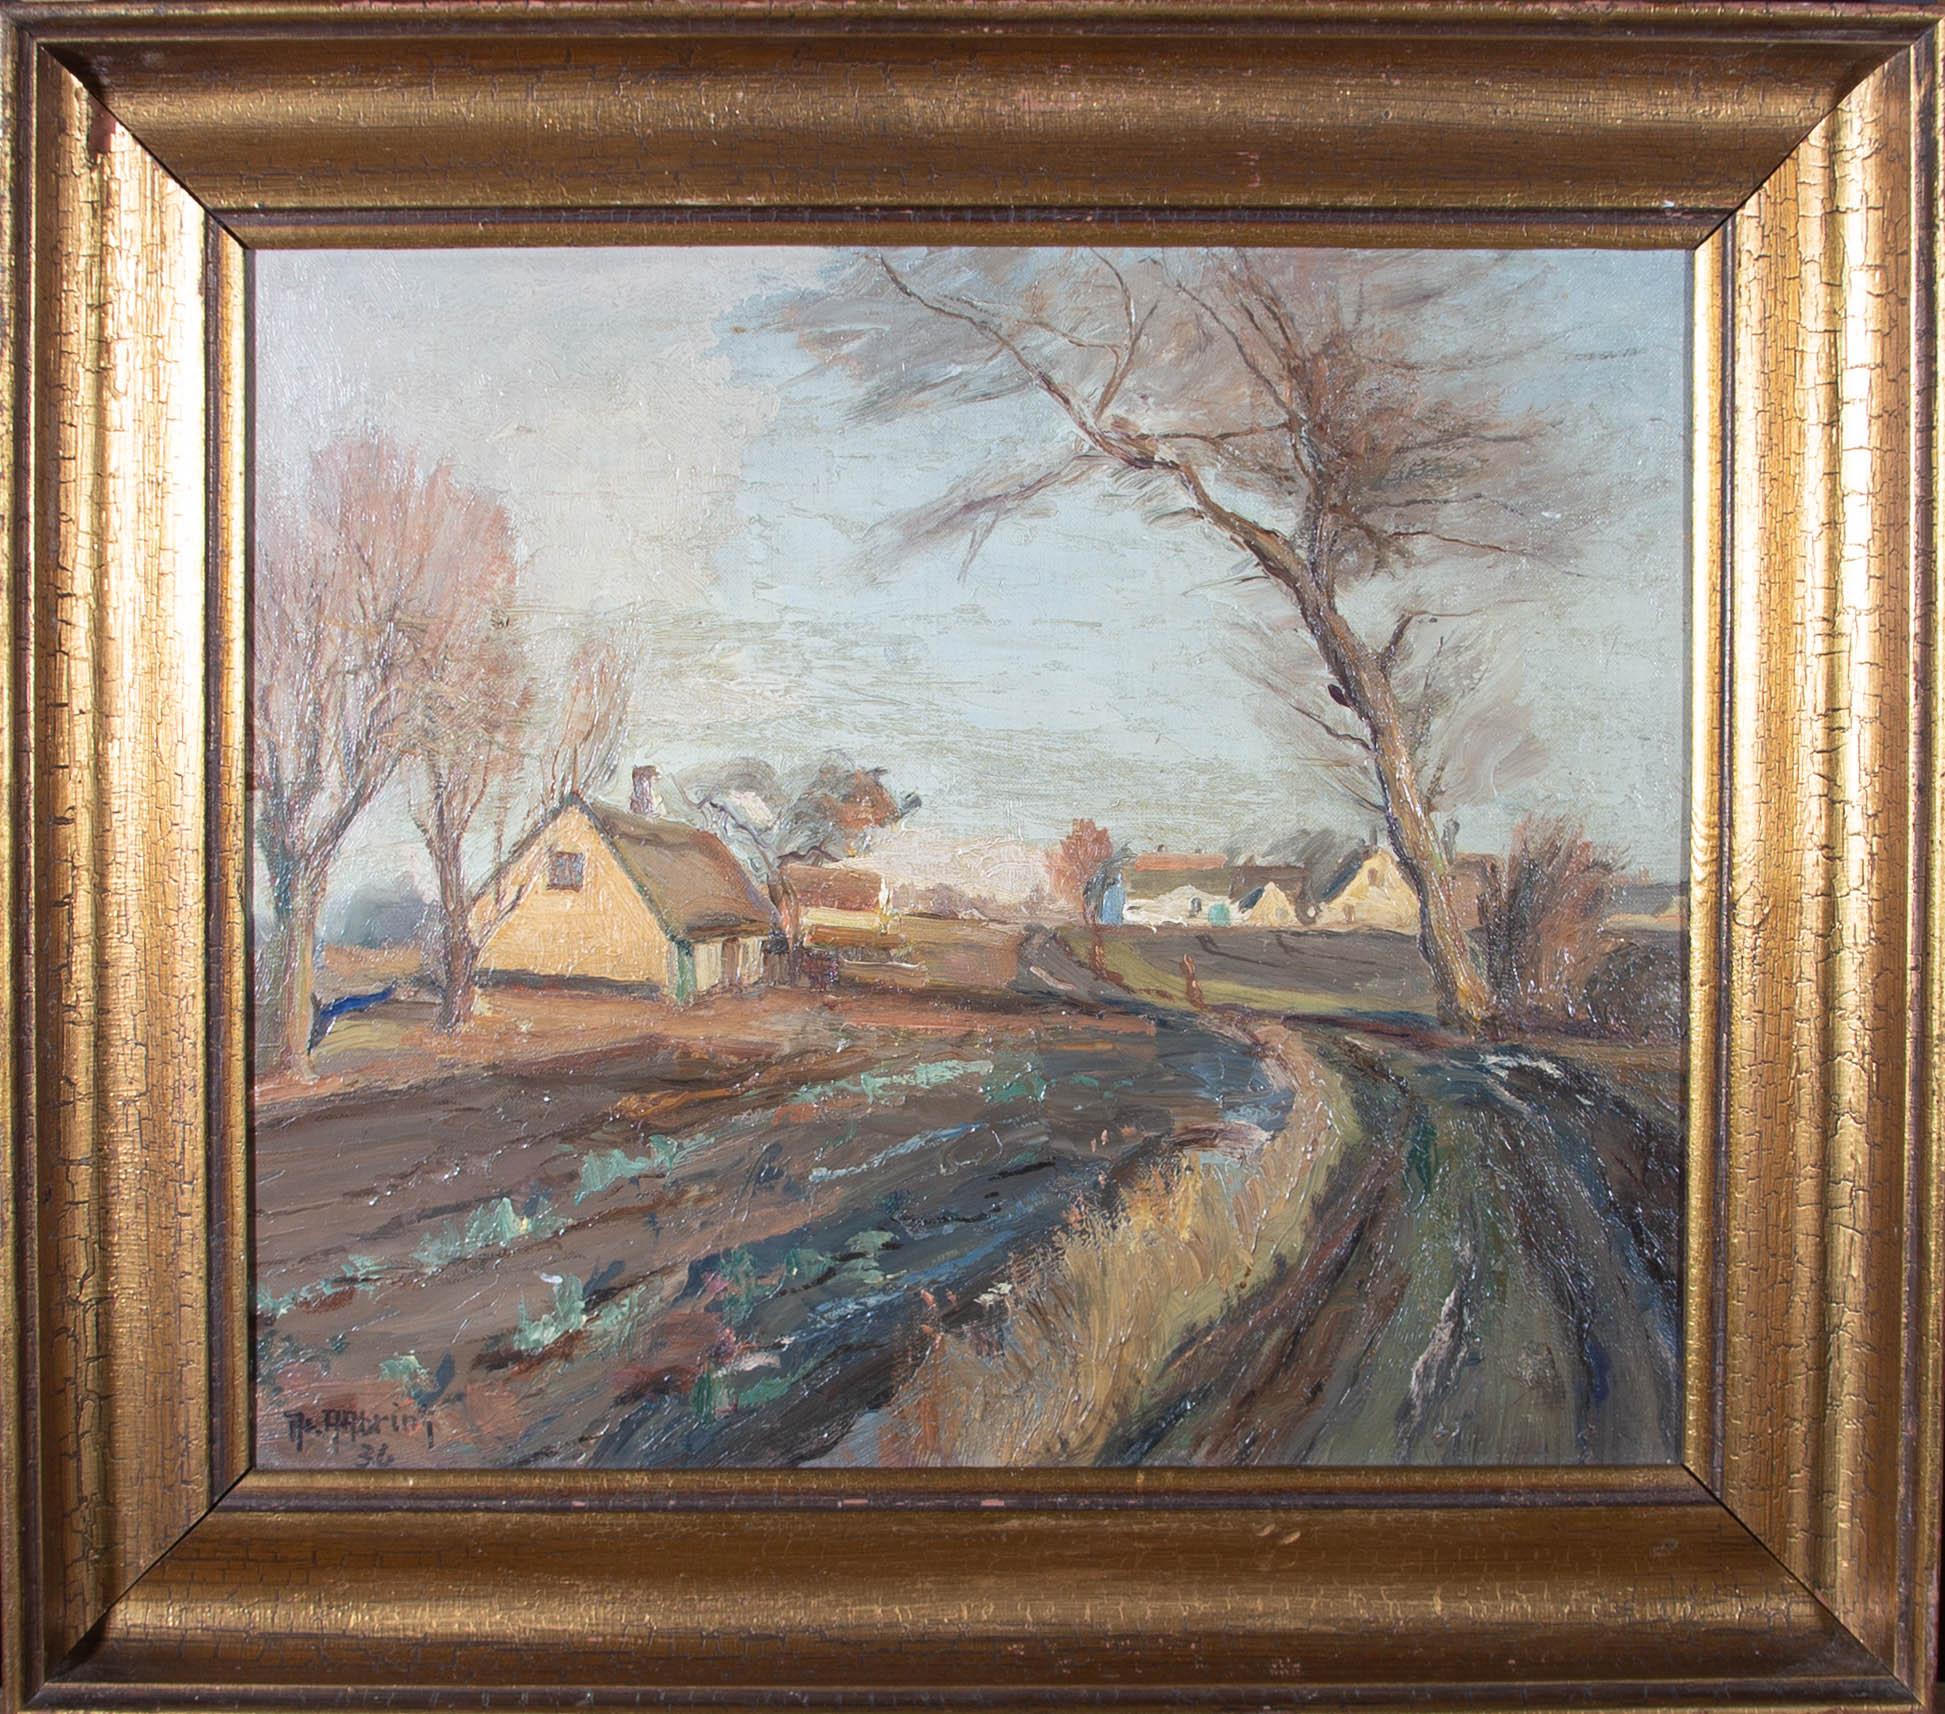 Axel Aabrink (1887-1965) - 1936 Oil, Farm Scene